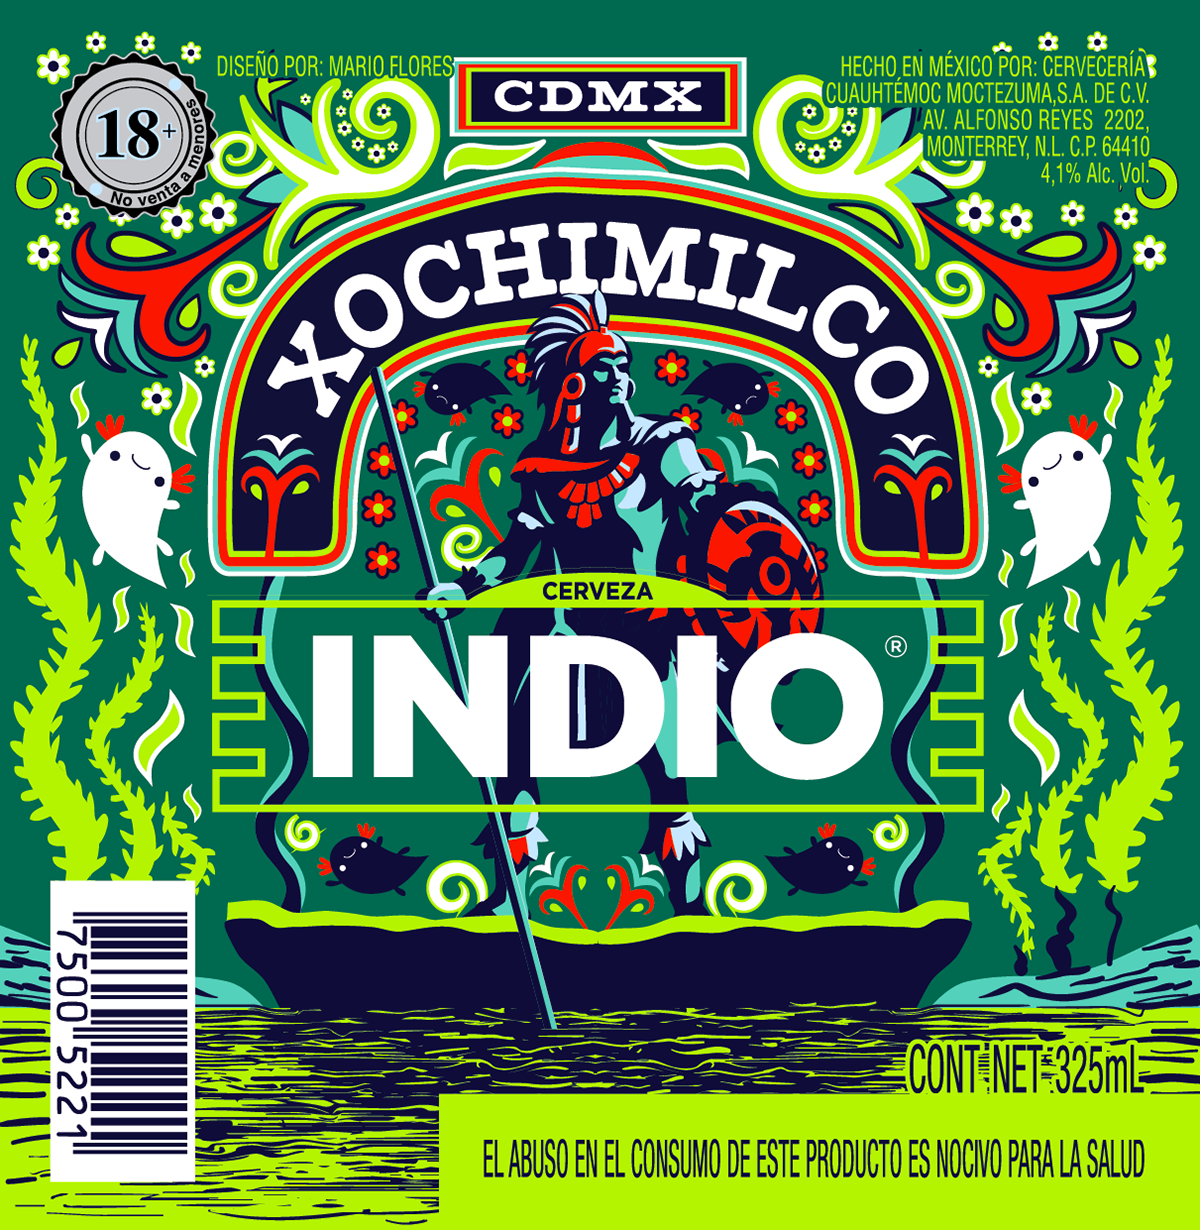 Cerveza Indio - Barrios